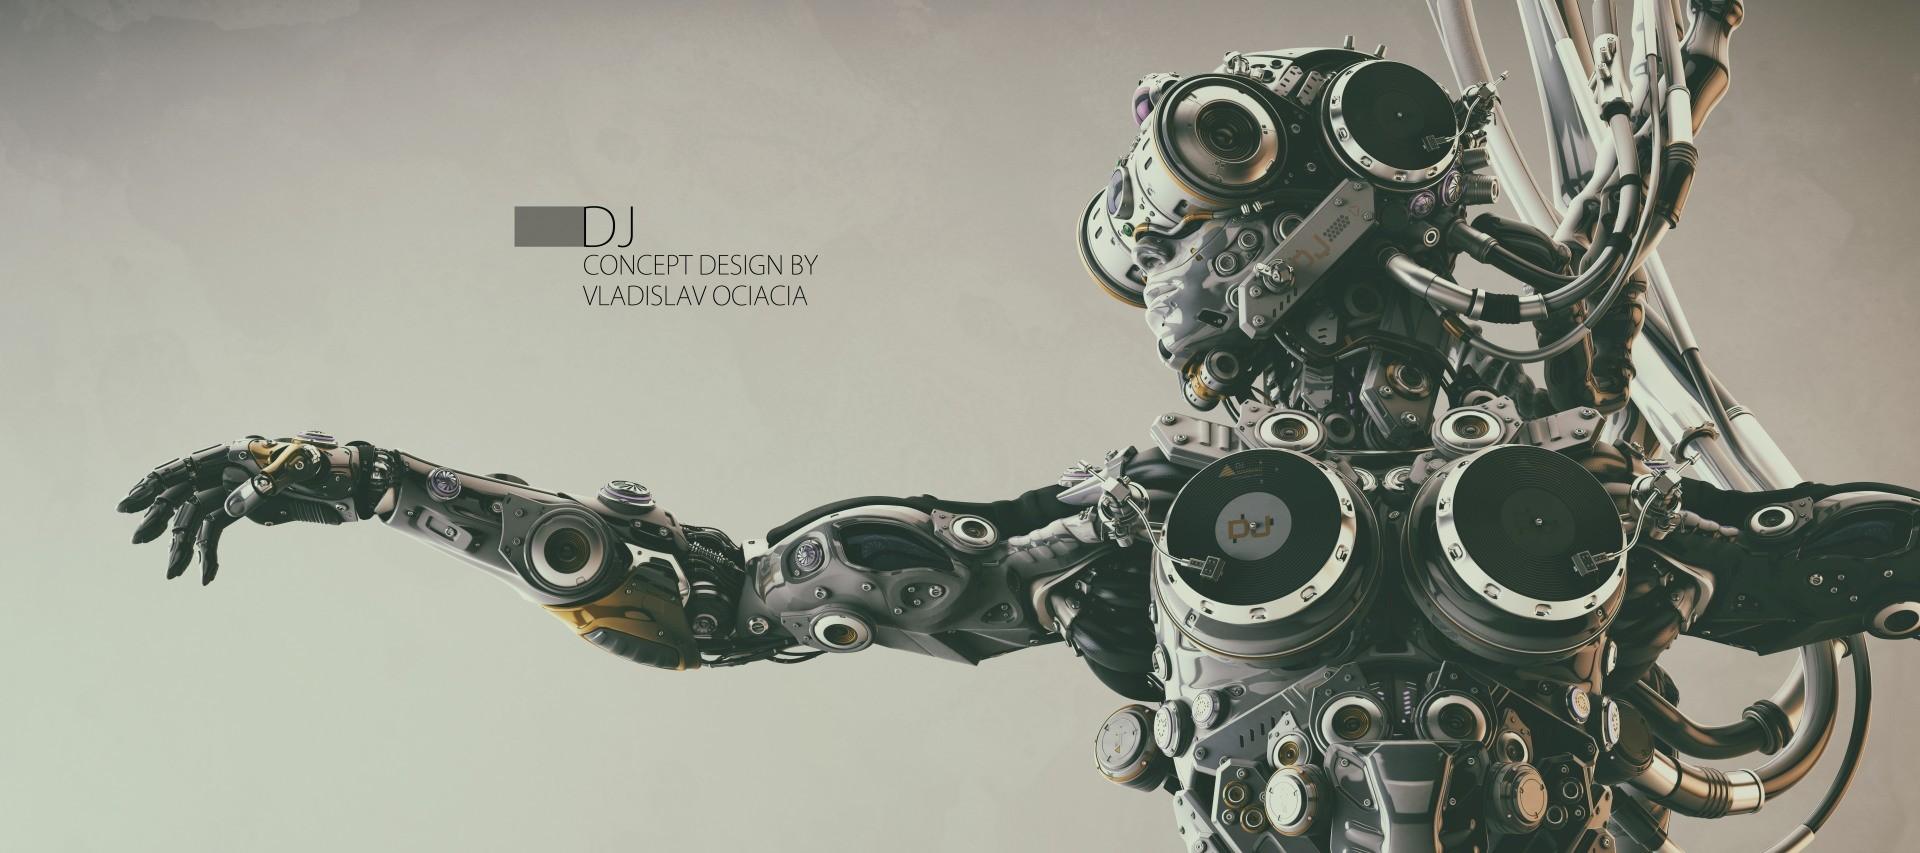 Vladislav ociacia robot dj 2